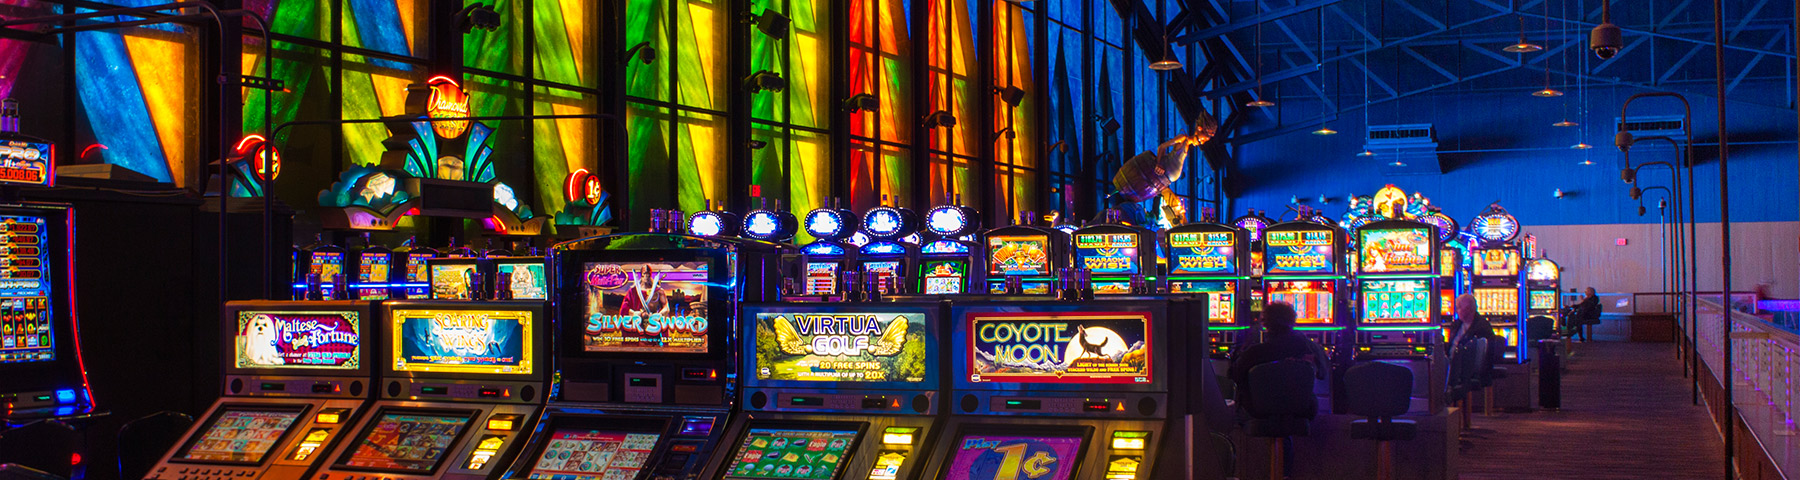 grindstone creek casino